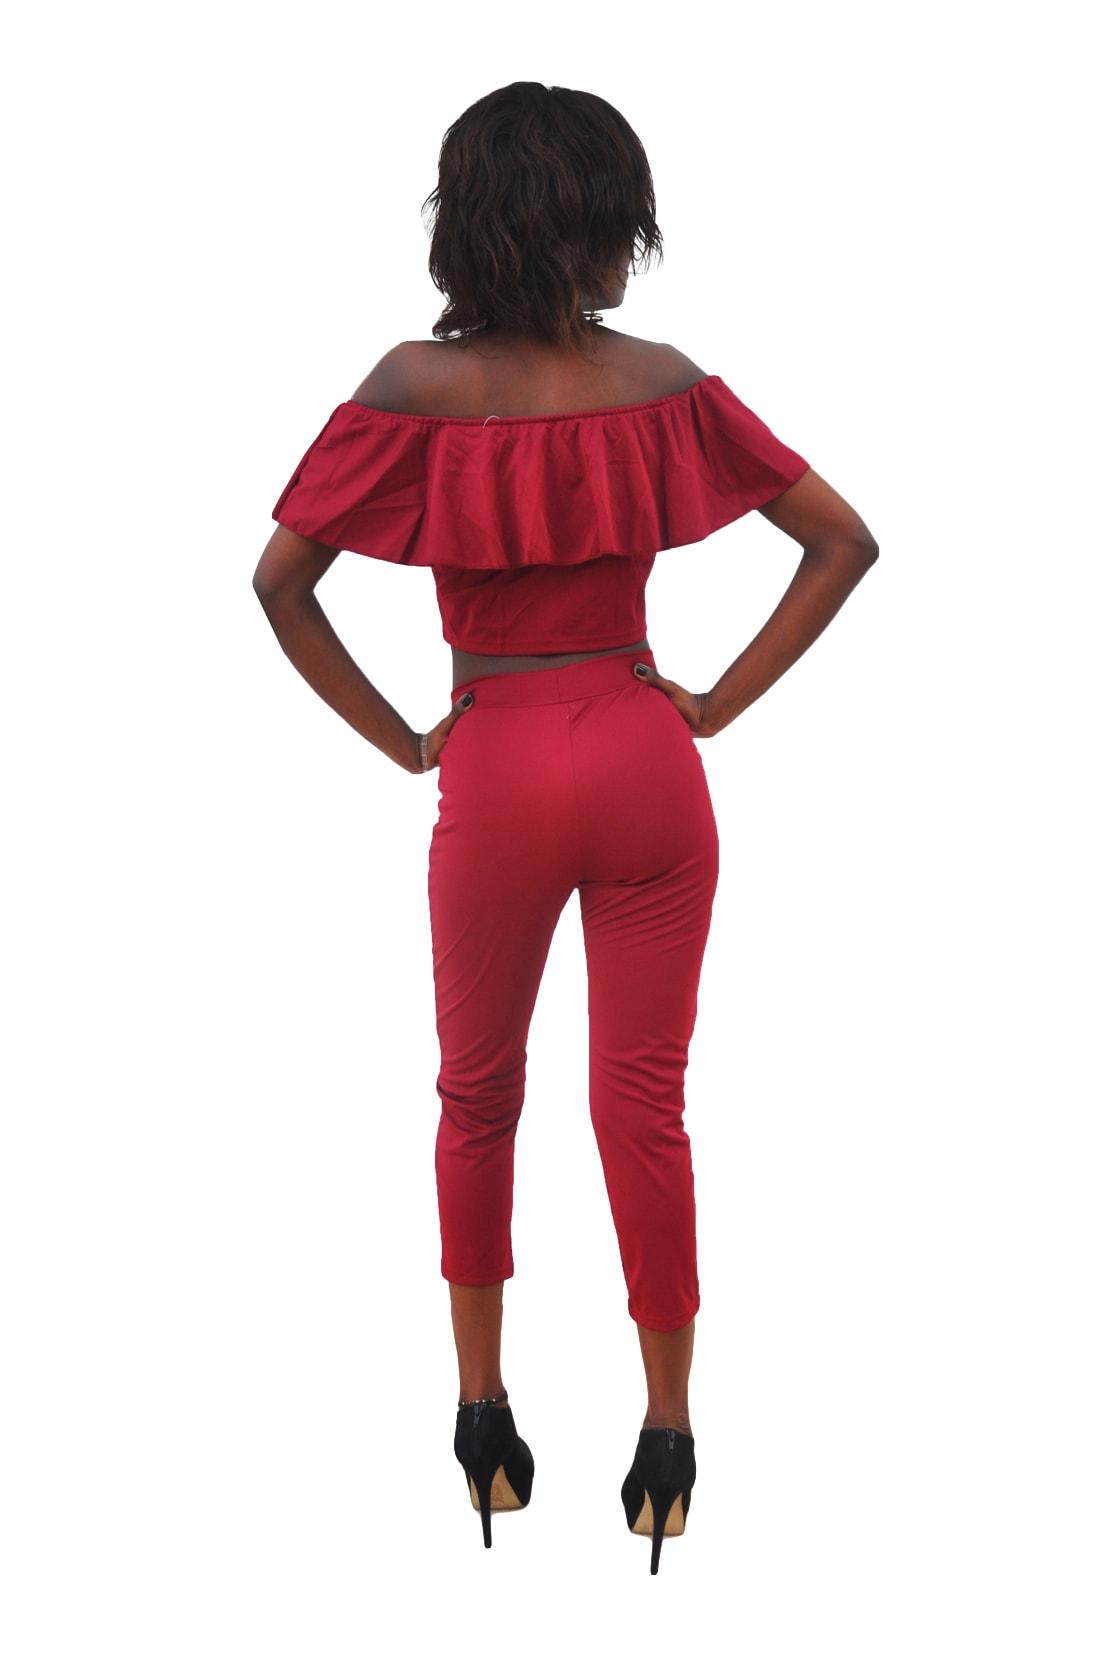 M0271 red2 Mini Dresses maureens.com boutique